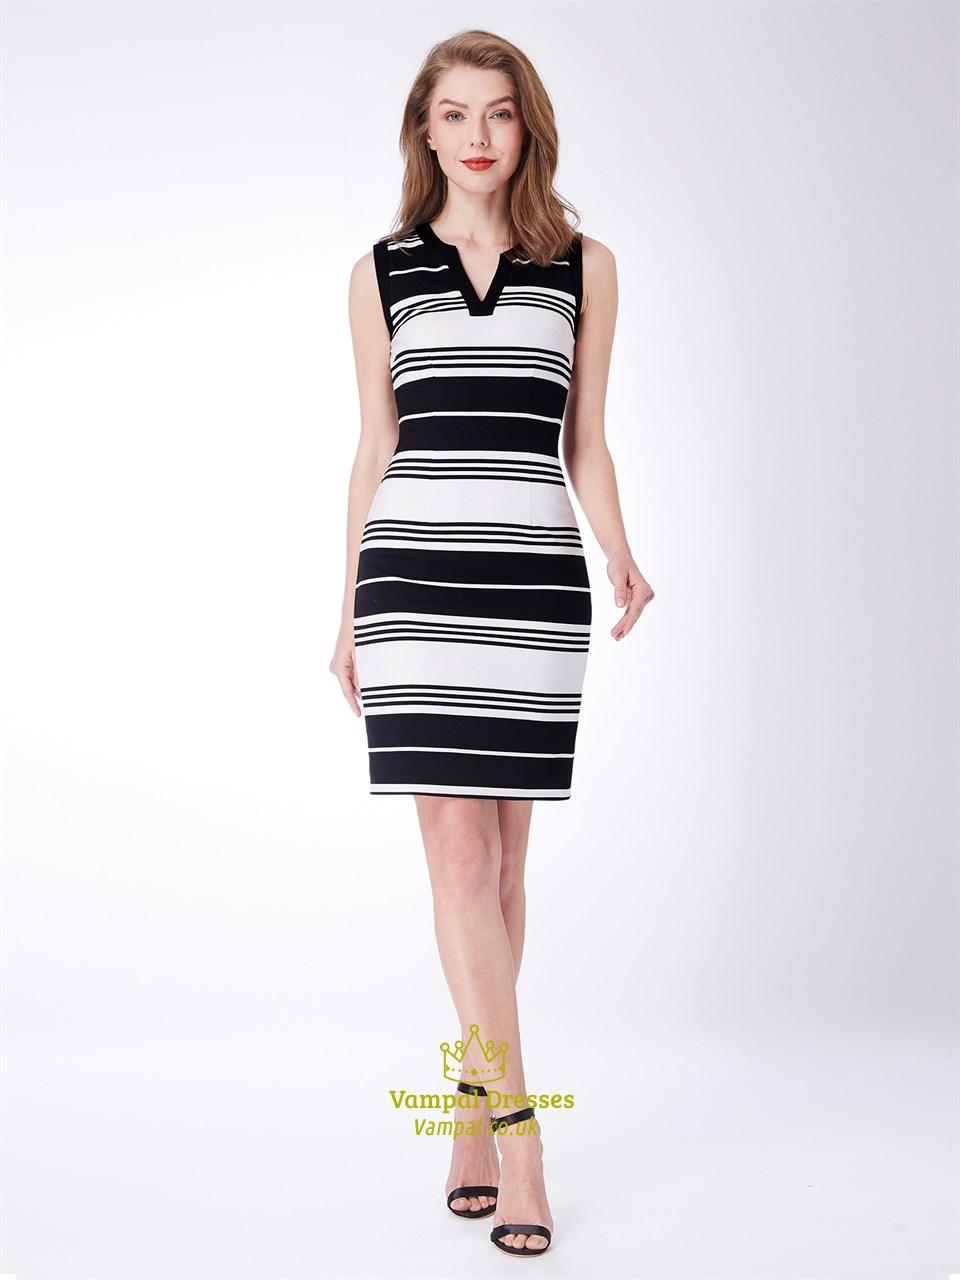 Black And White V Neck Sleeveless Sheath Knee Length Striped Dress SKU -C619 48a4a079b